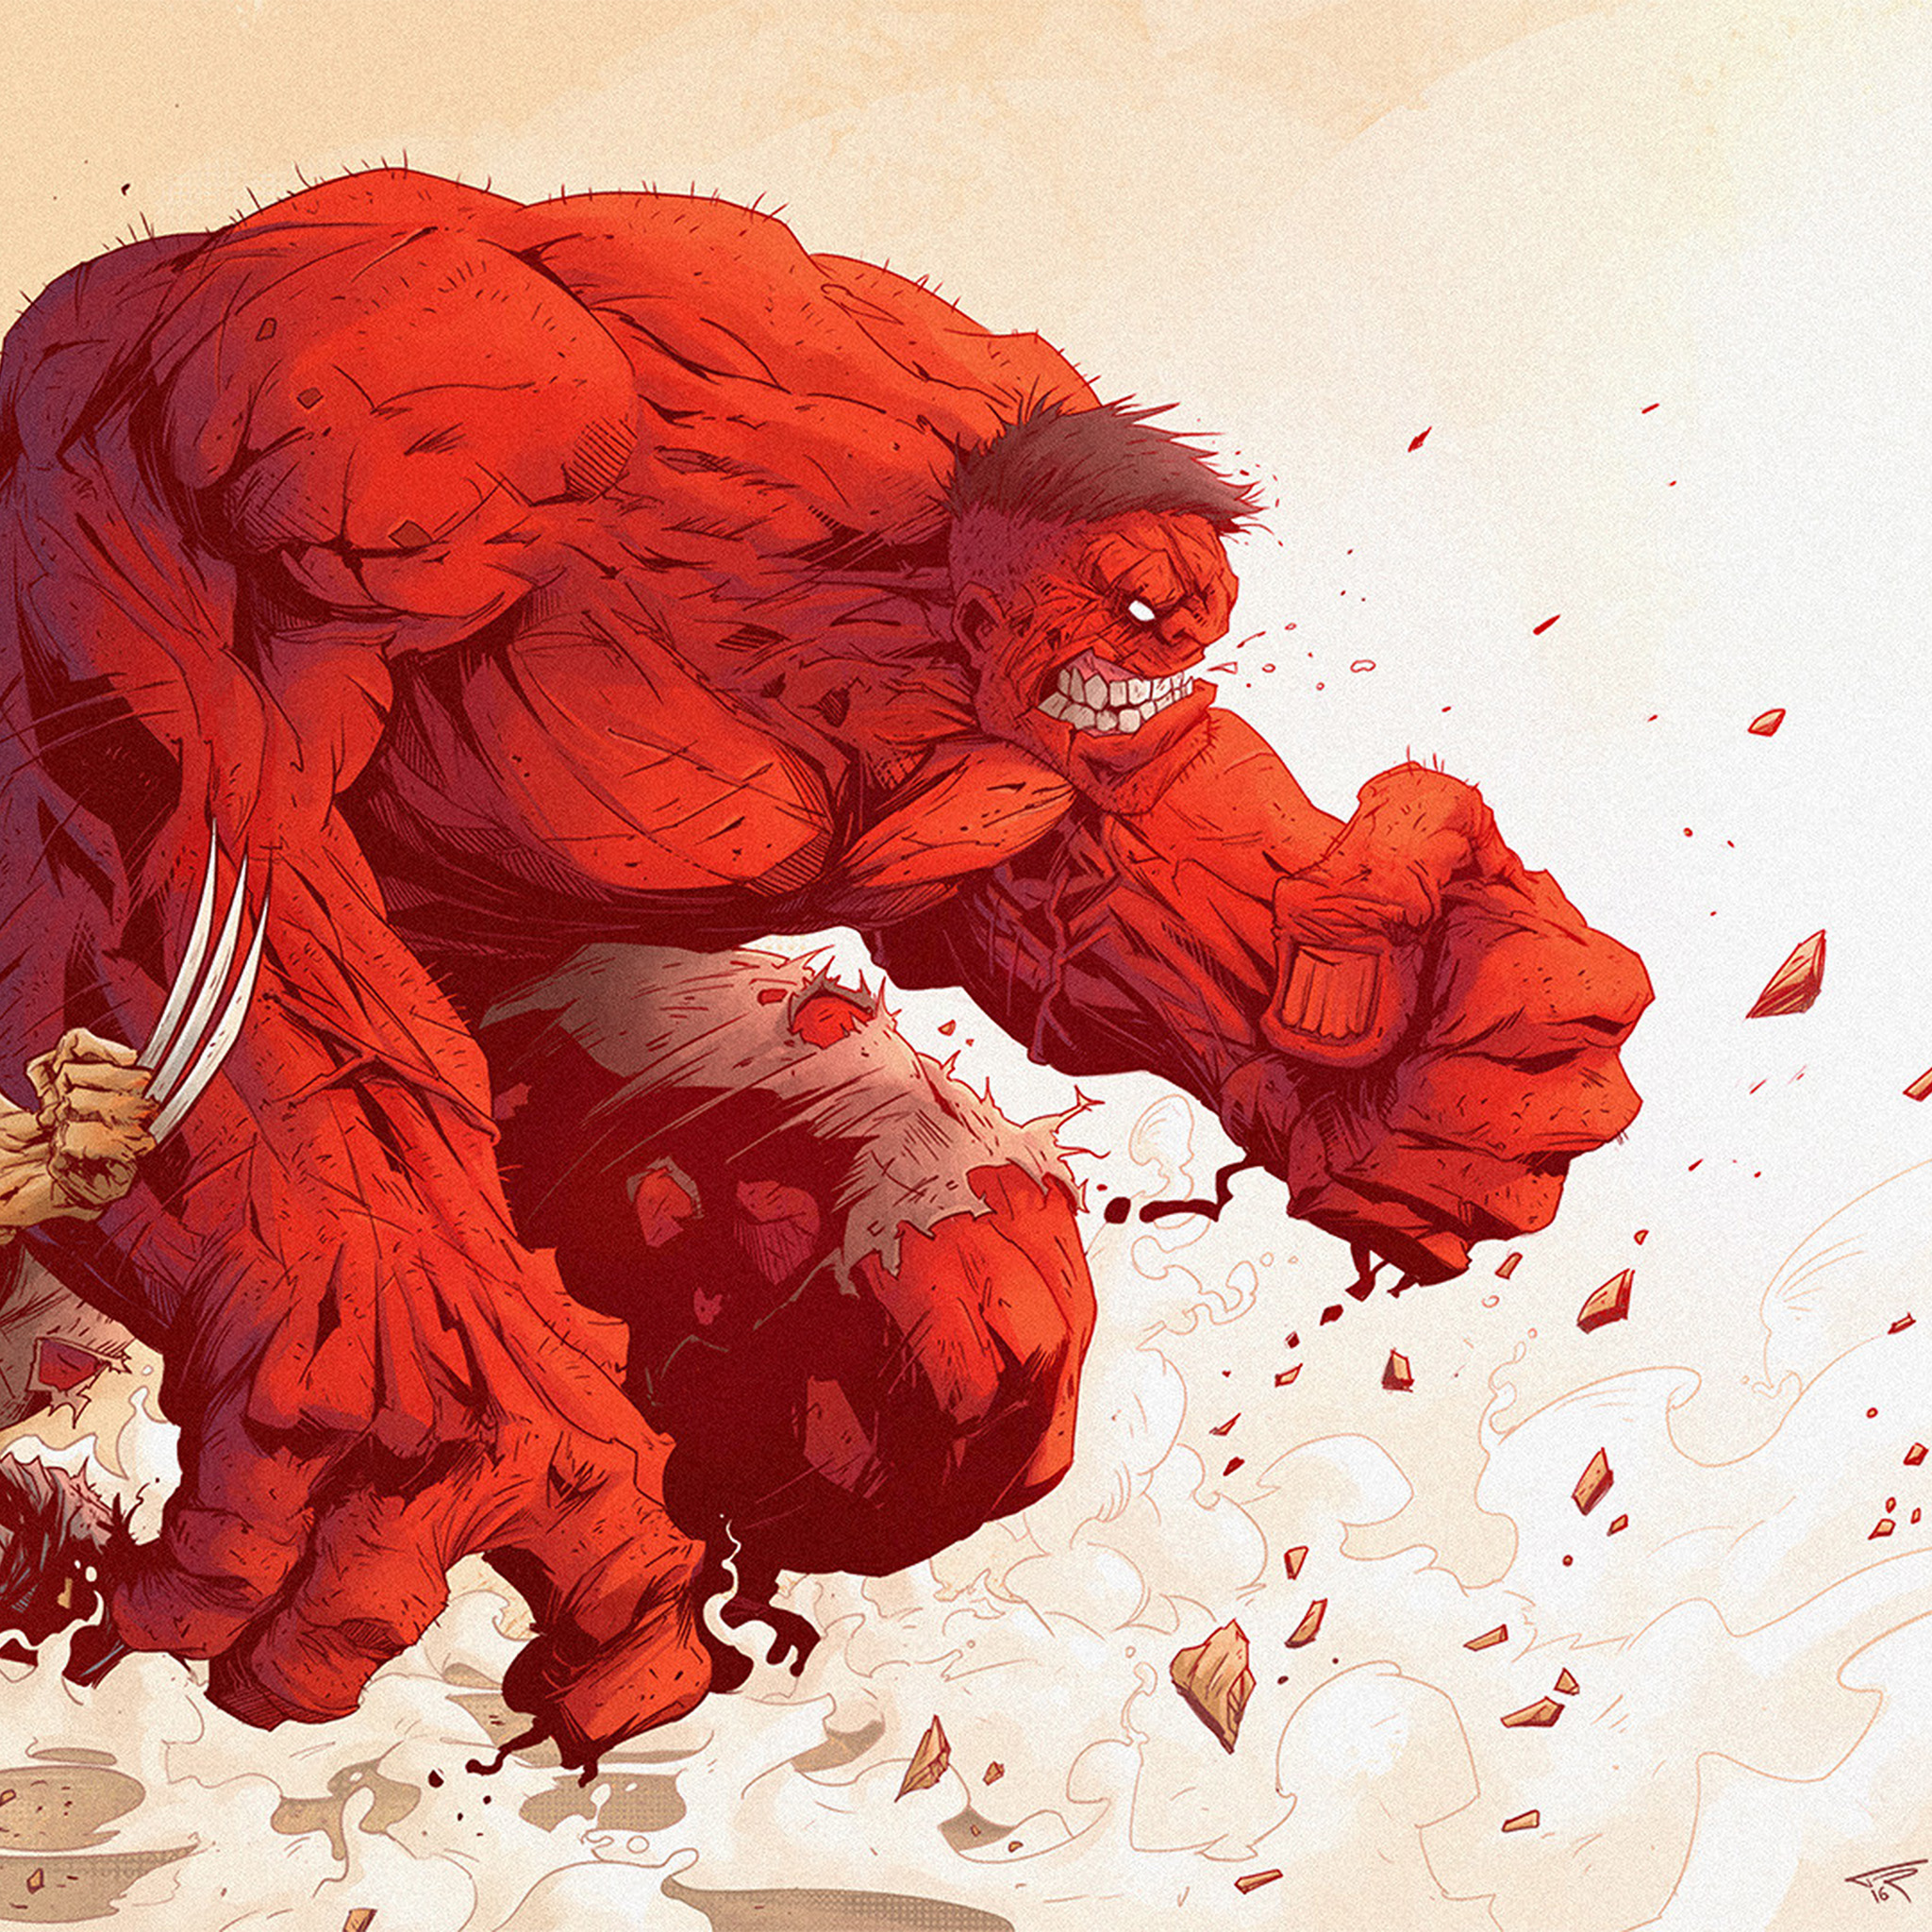 Hulk Wallpaper Iphone X Aw95 Hulk Anime Tonton Revolver Illustration Art Red Hero